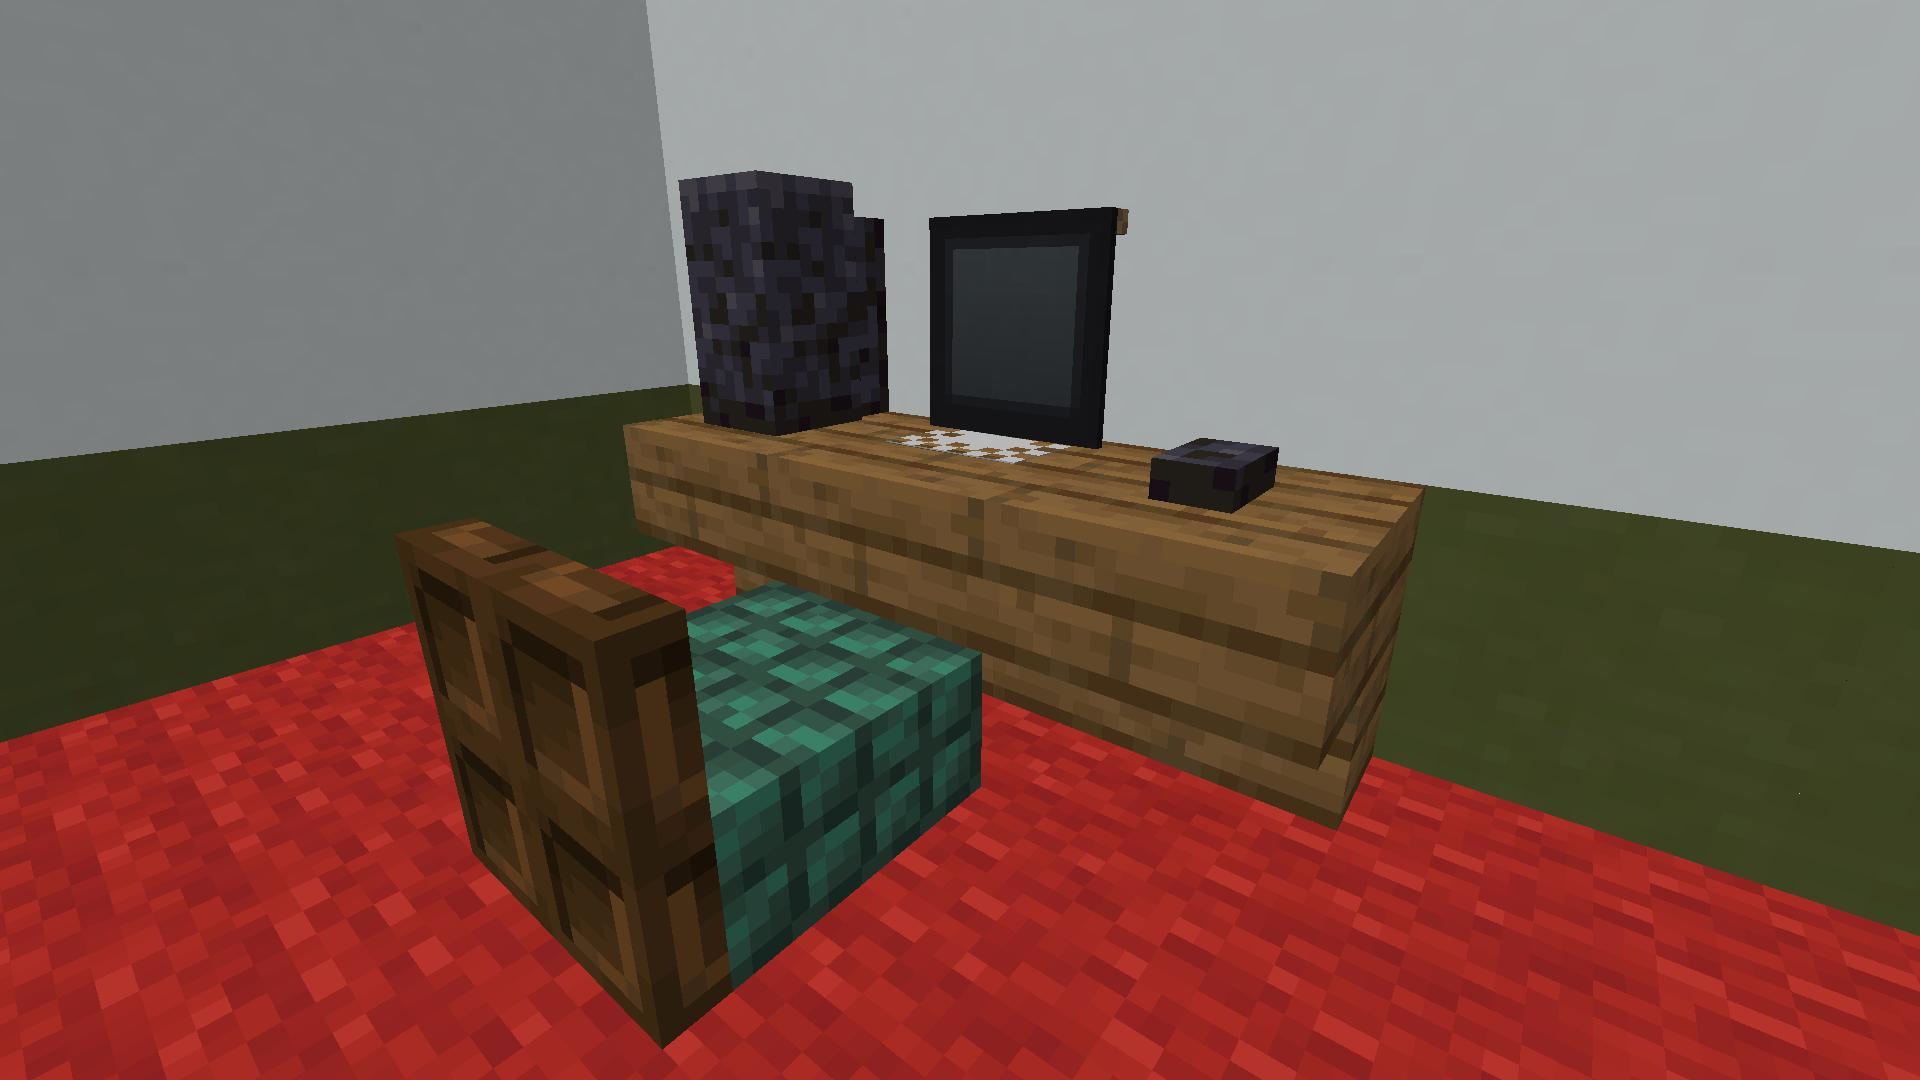 Minecraft Computer Desktop